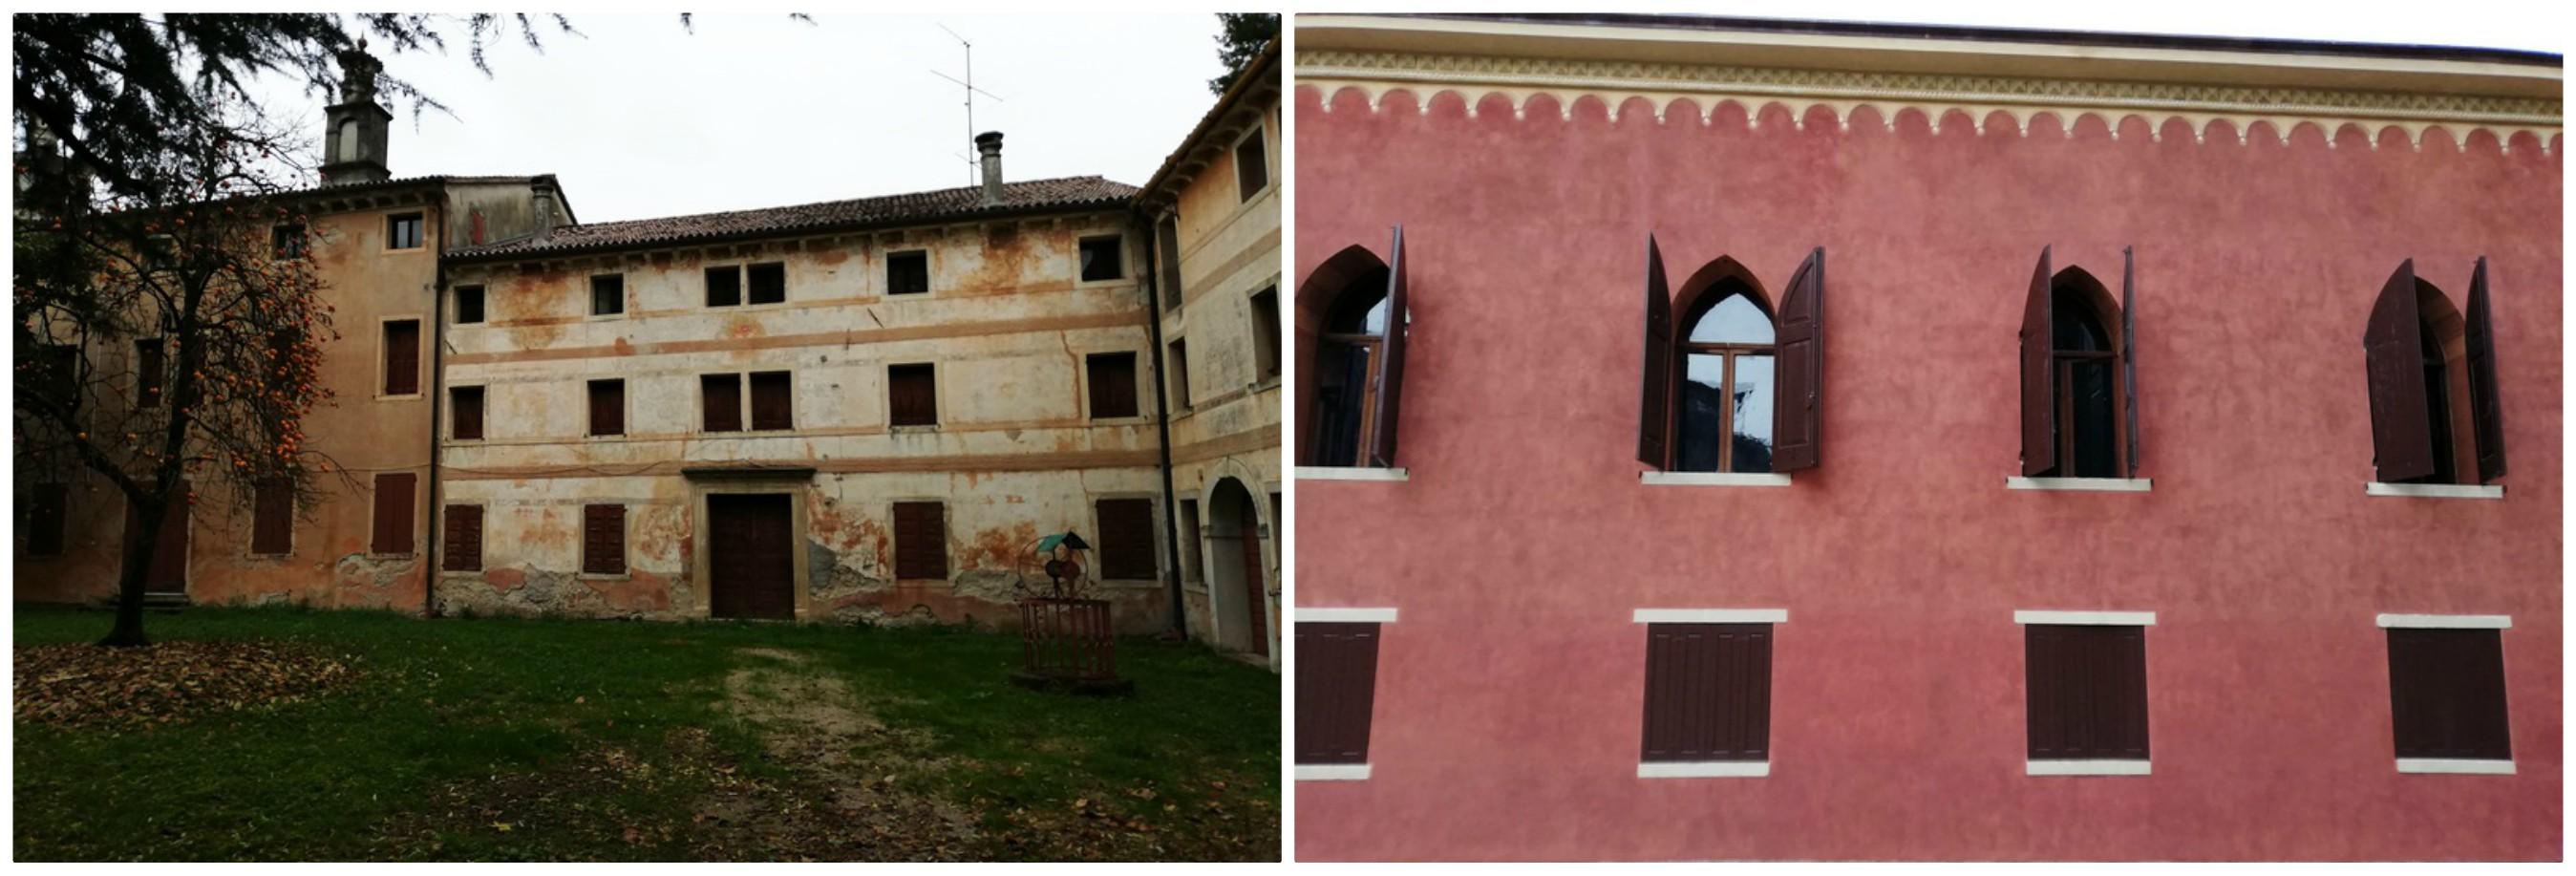 Refrontolo - Villa Spada